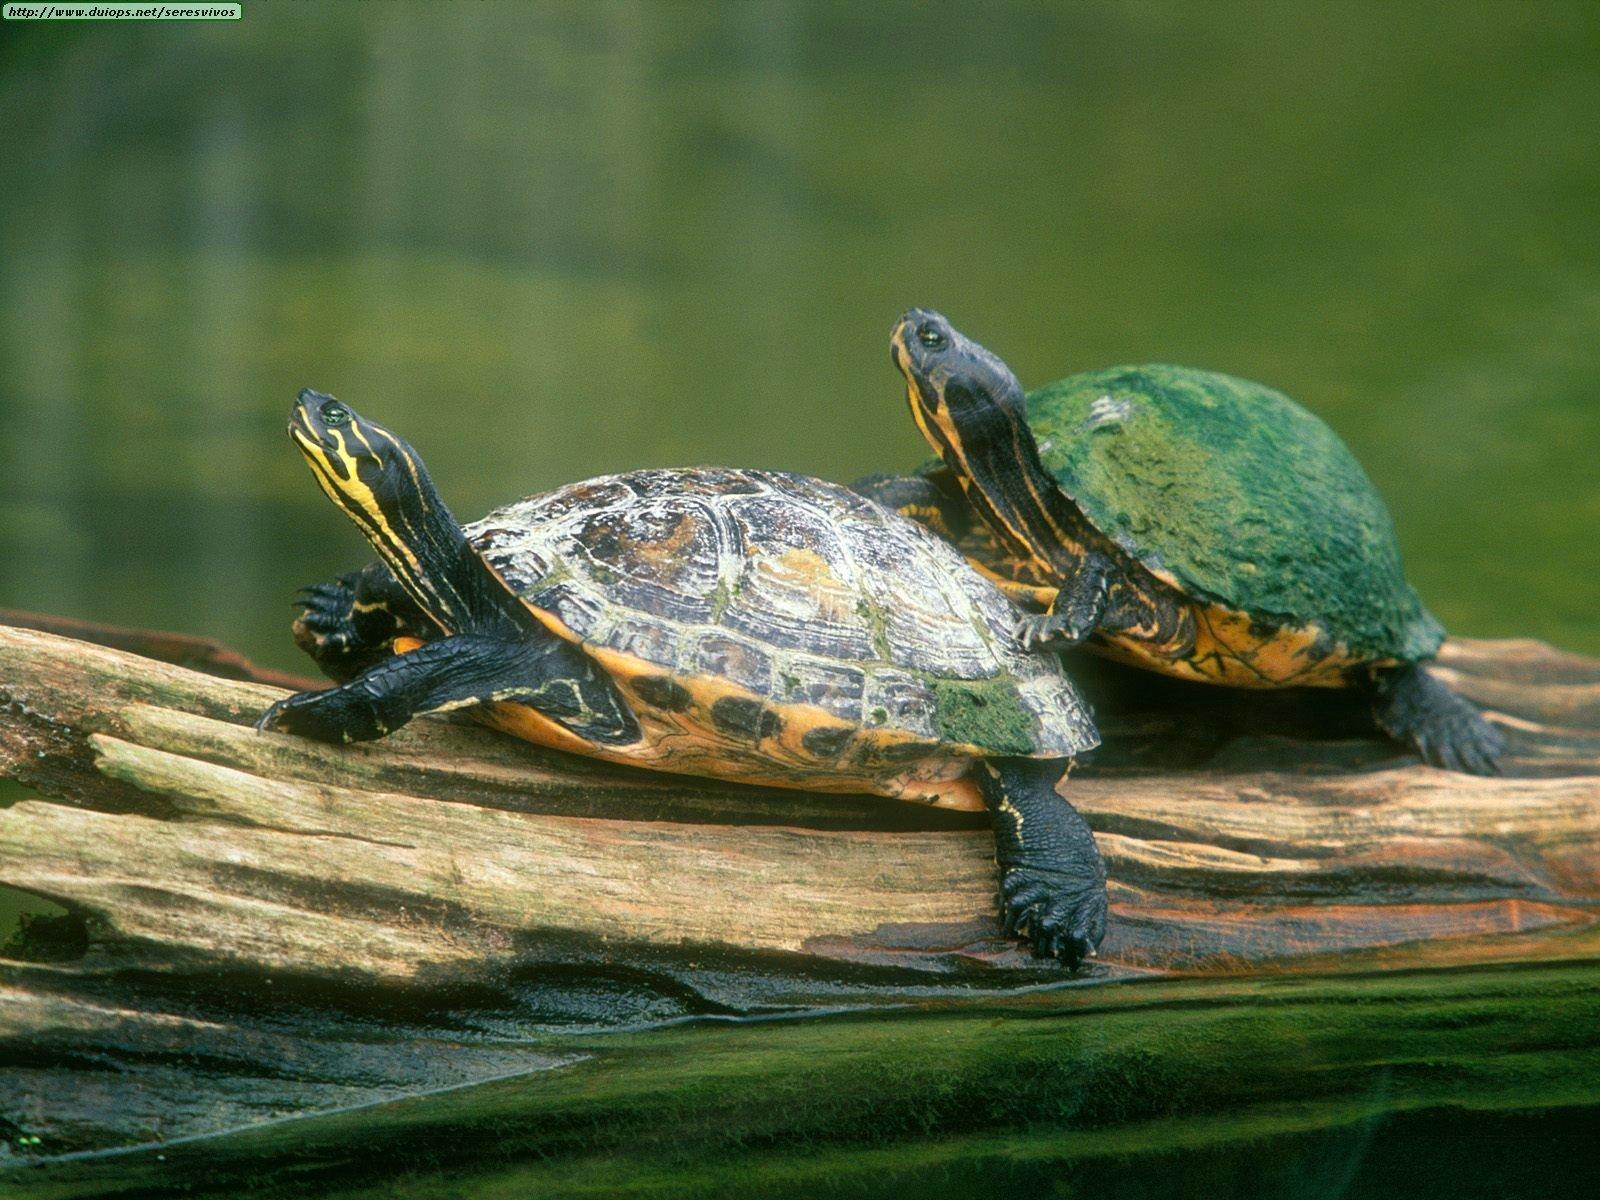 Turtles turtles photo 6007158 fanpop - Cute turtle pics ...